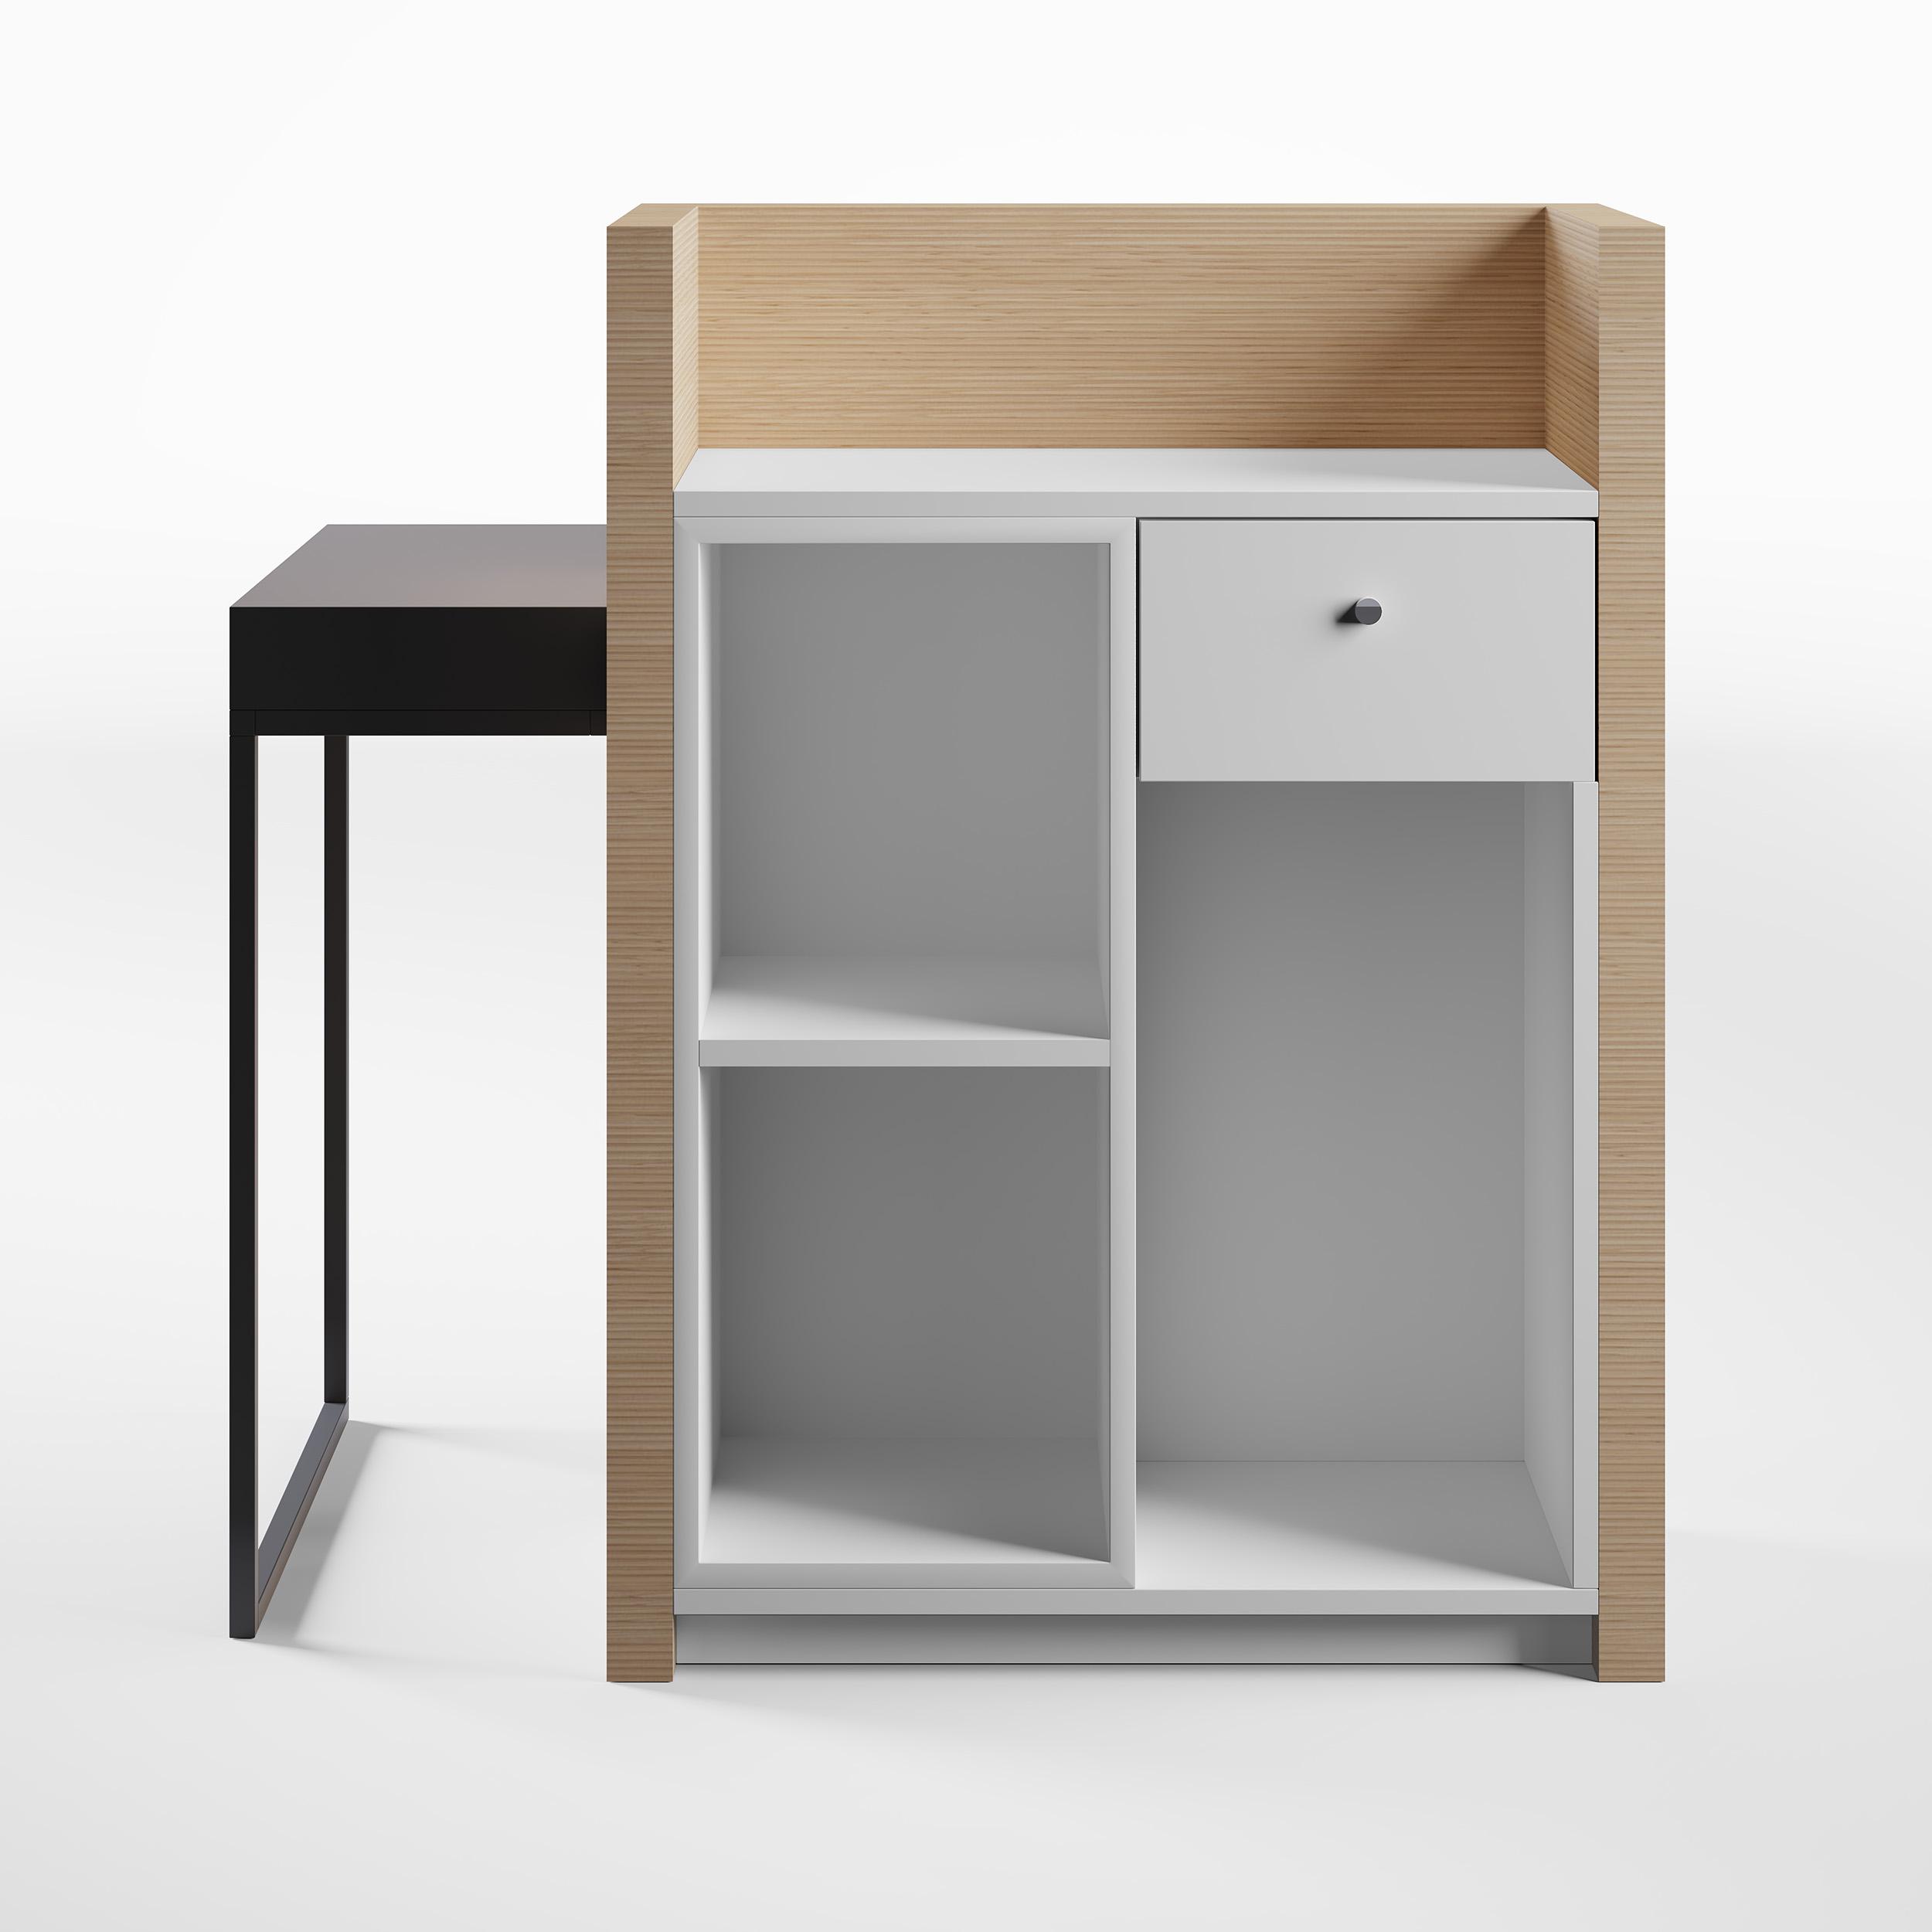 PHILOSOPHY_cash desk model 110_C copy.jpg